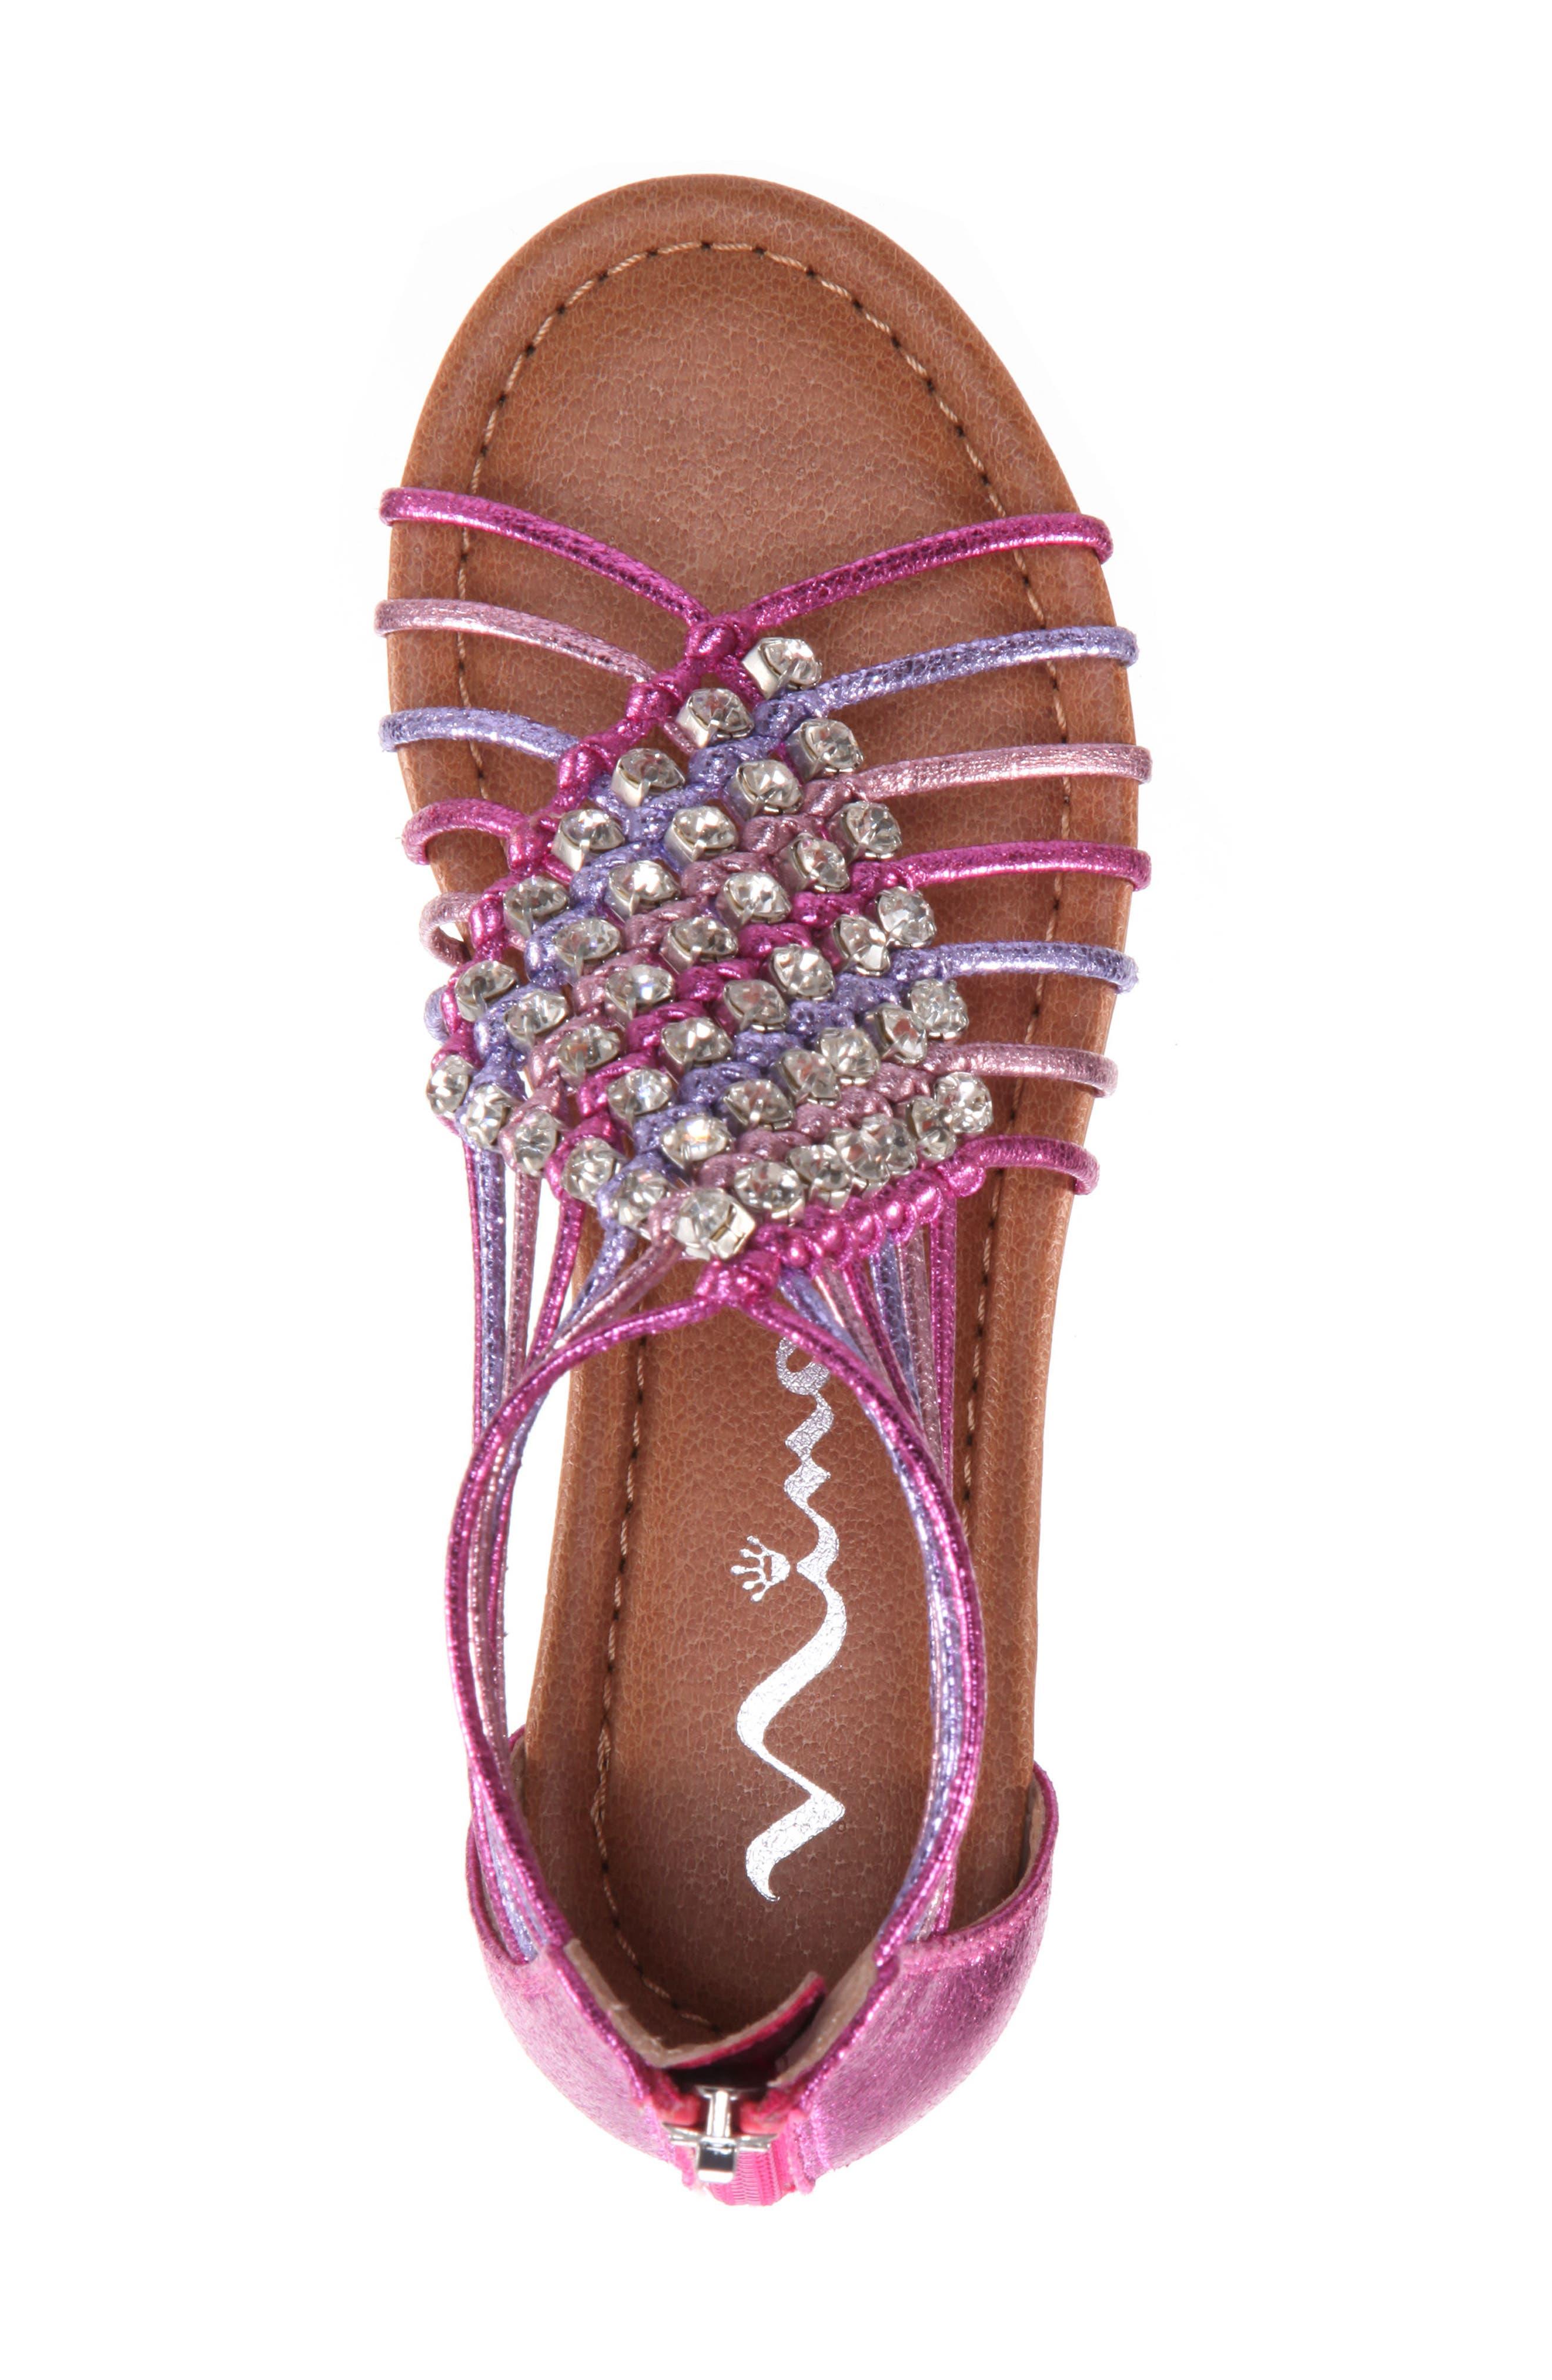 Karlee Embellished Sandal,                             Alternate thumbnail 5, color,                             Pink Multi Metallic Crackle